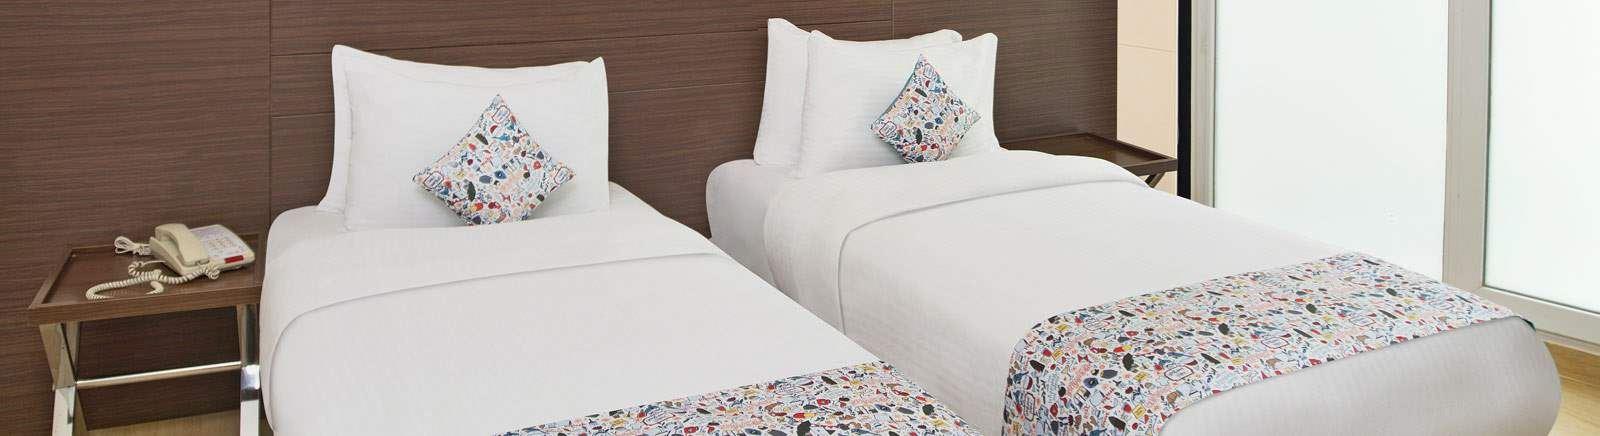 Ginger Vadodara RCR Hotel Rooms